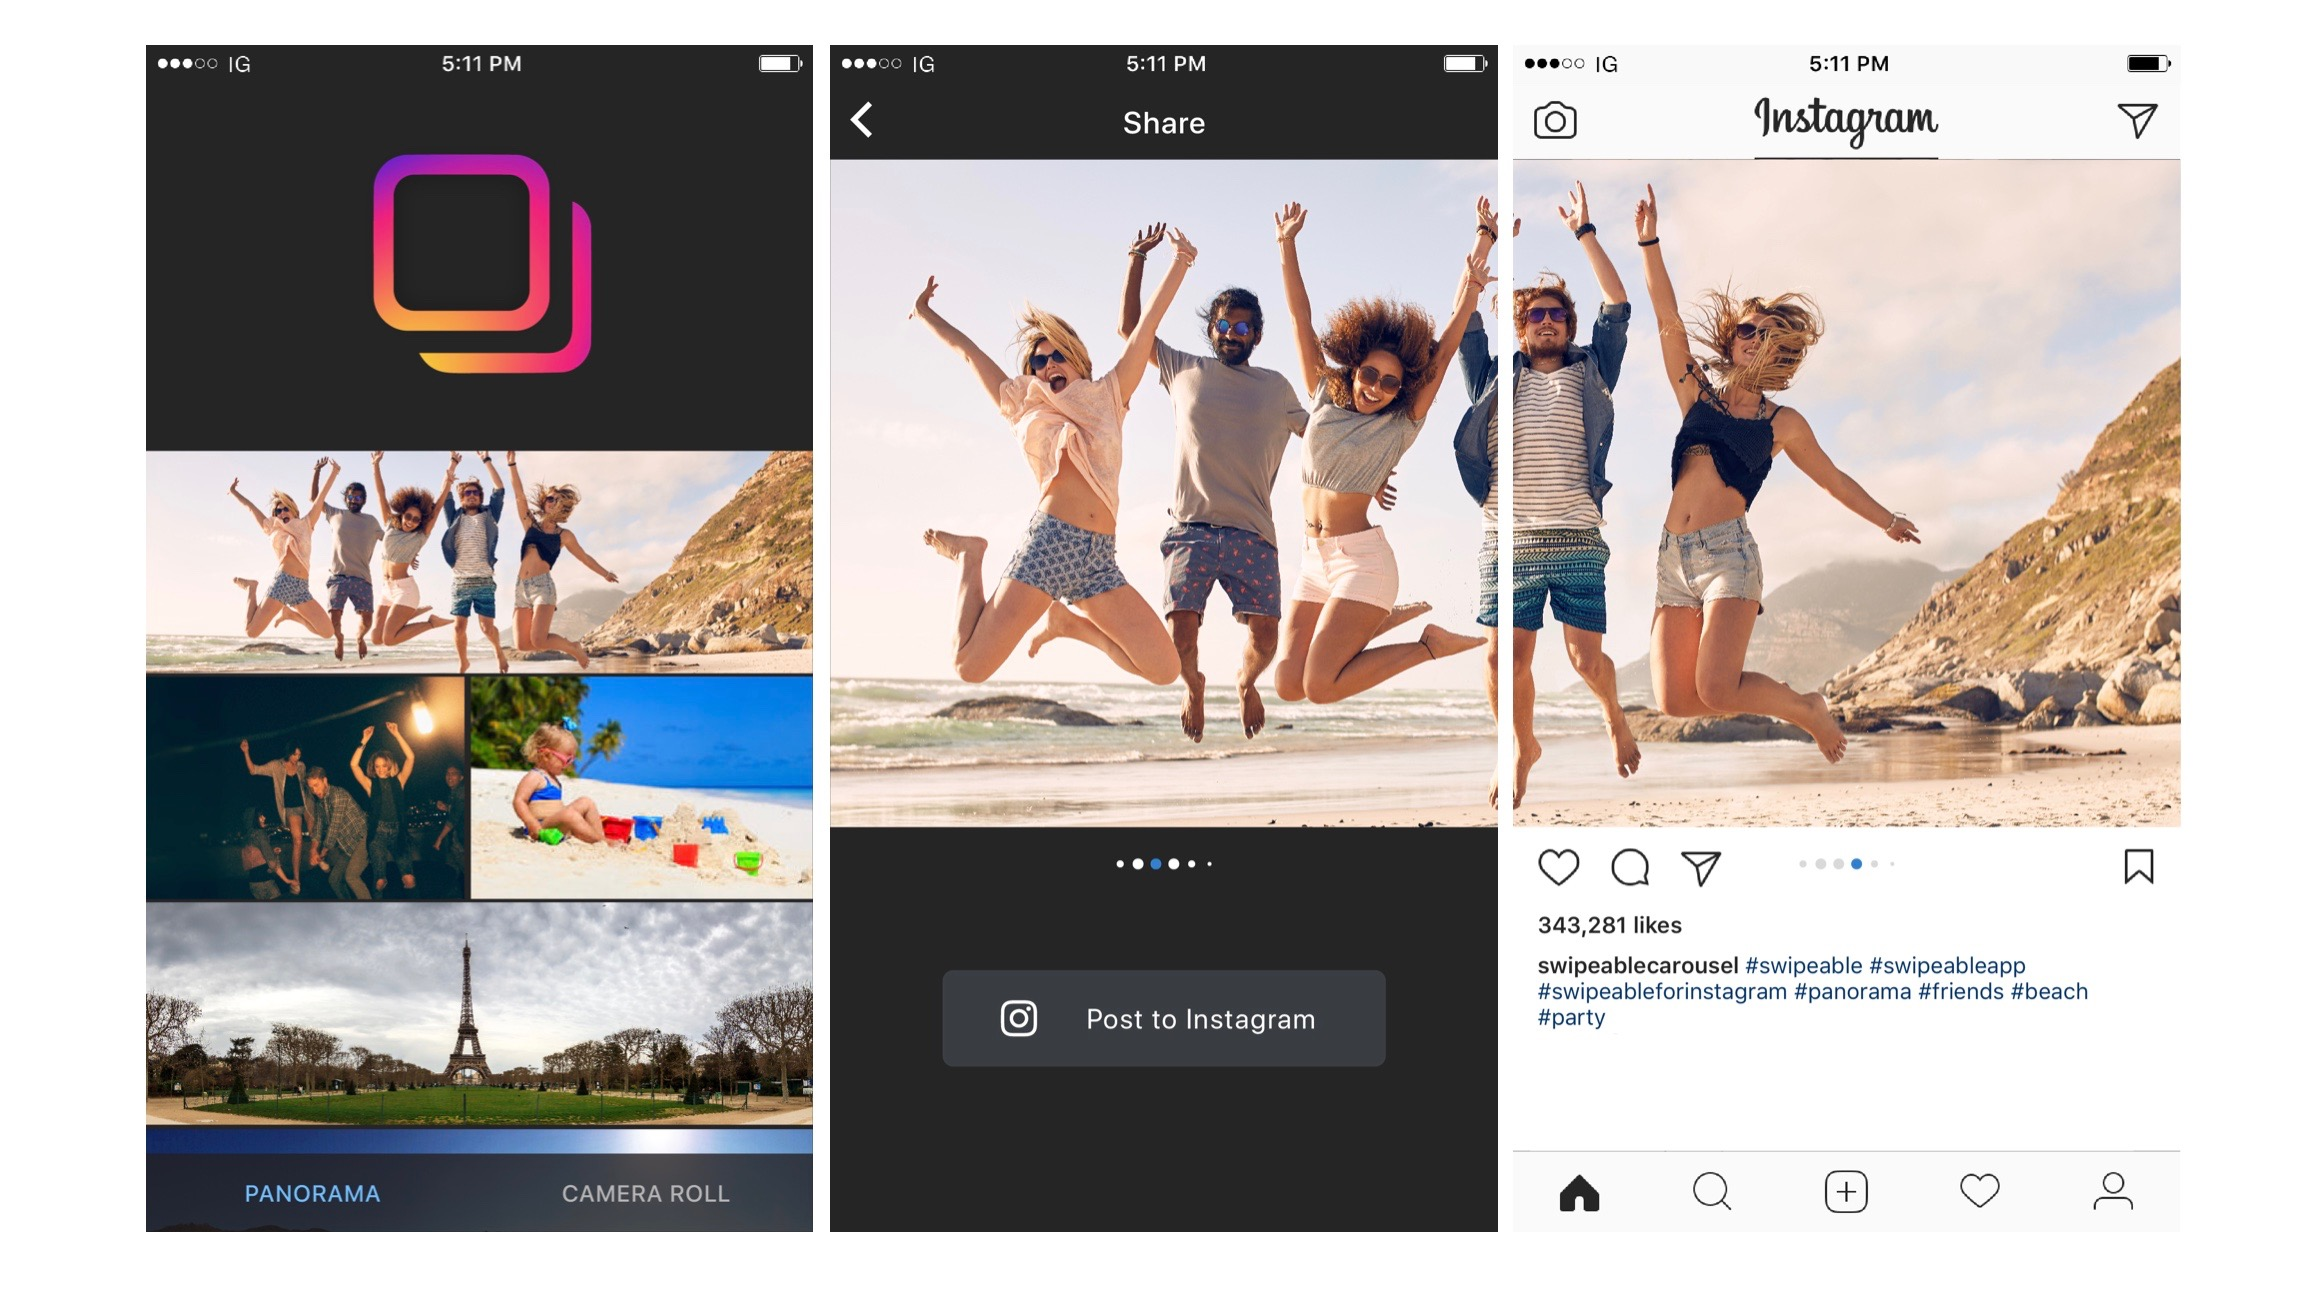 App Swipeable Panorama for Instagram